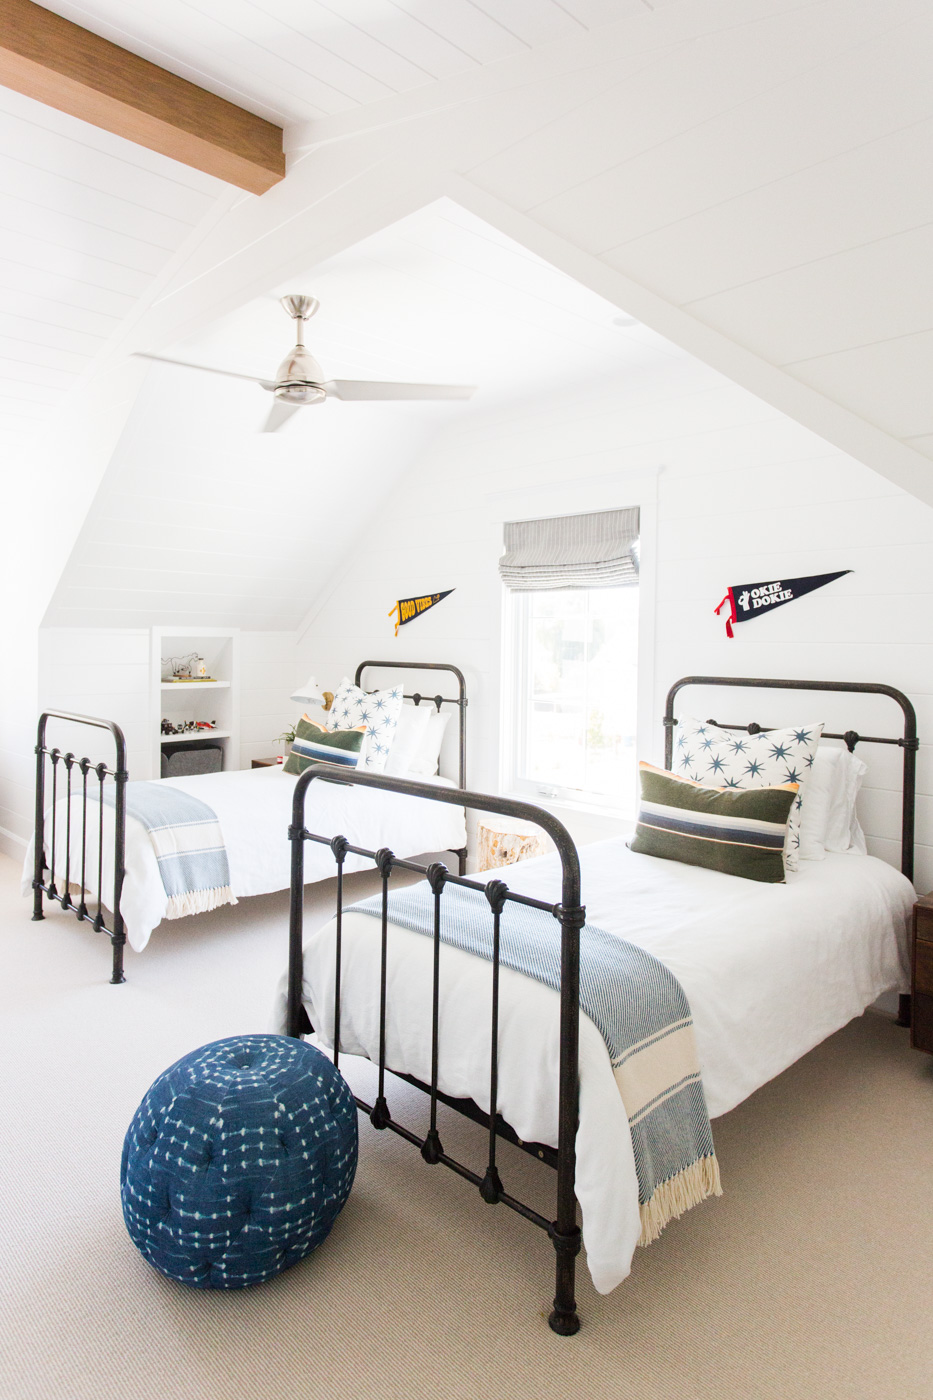 Boys'+room+with+twin+iron+beds+__+Studio+McGee.jpg